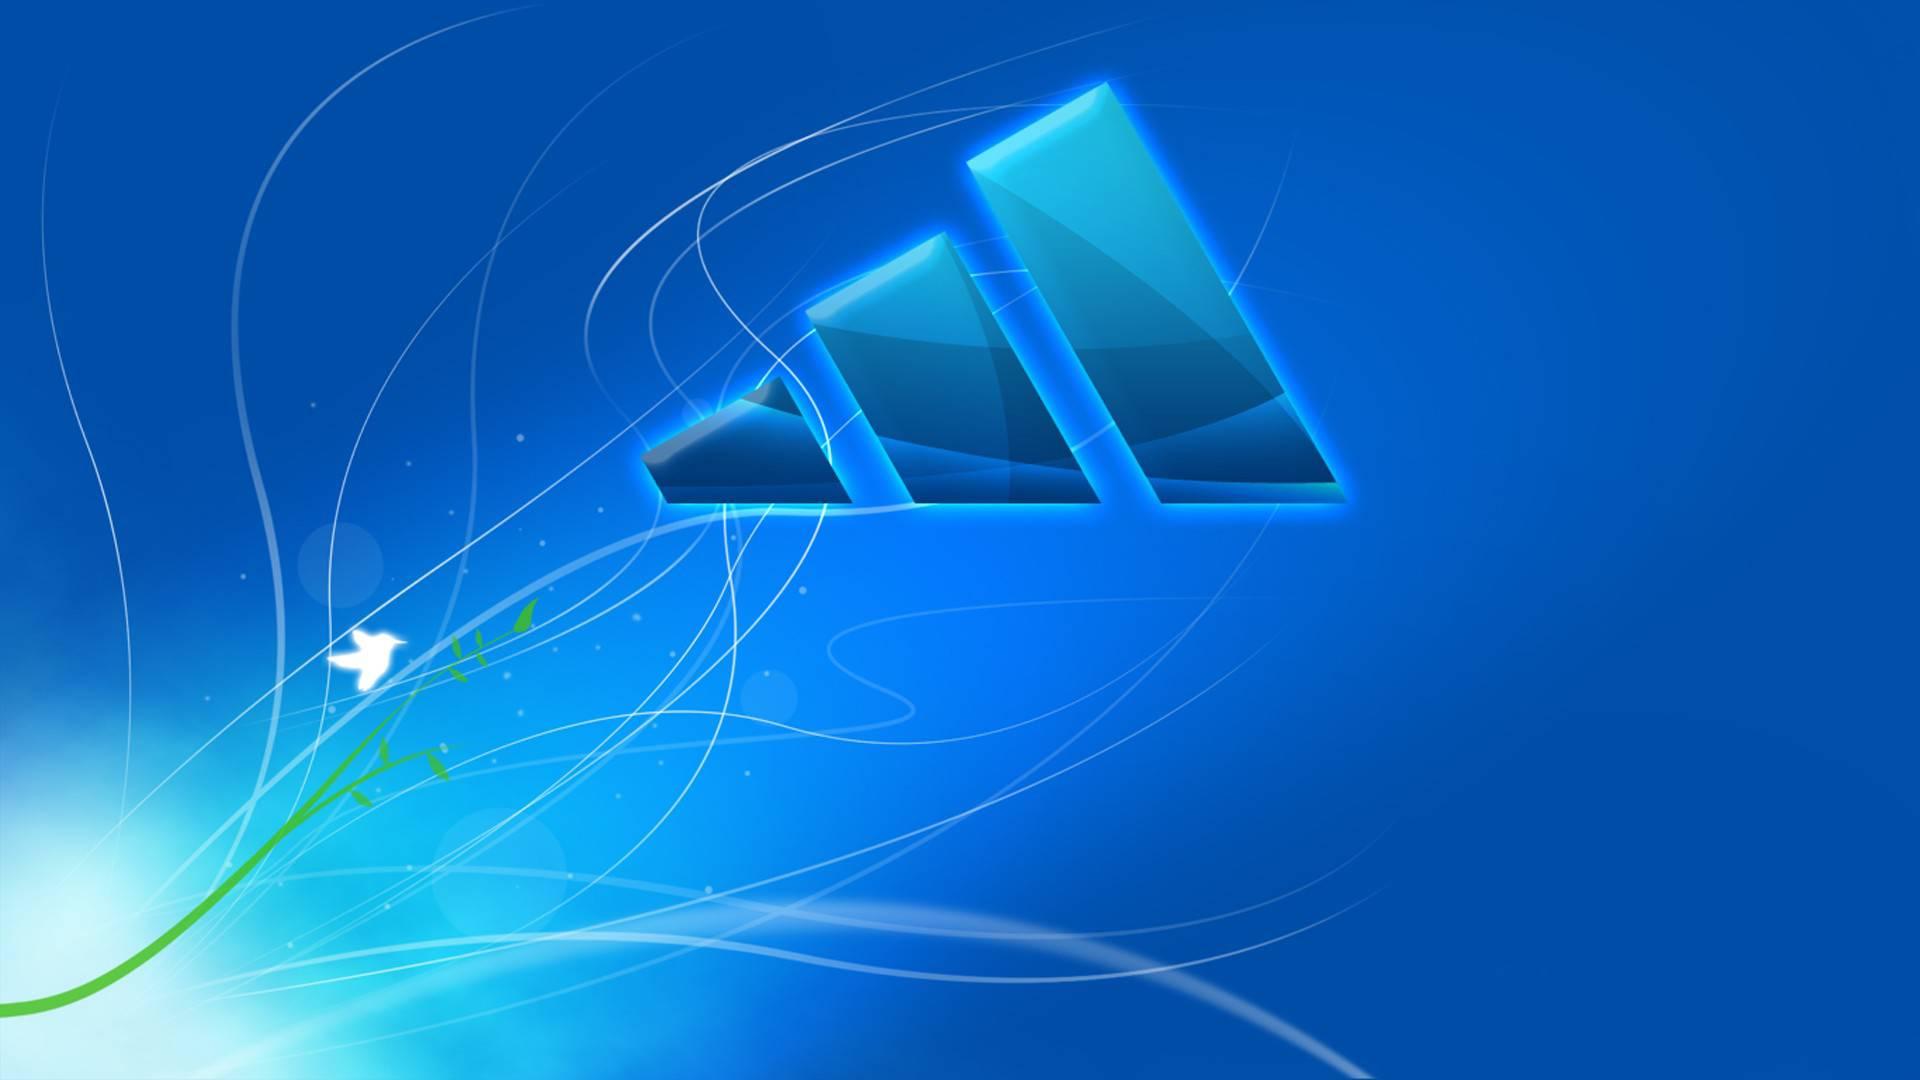 Windows 10 High Quality Wallpaper